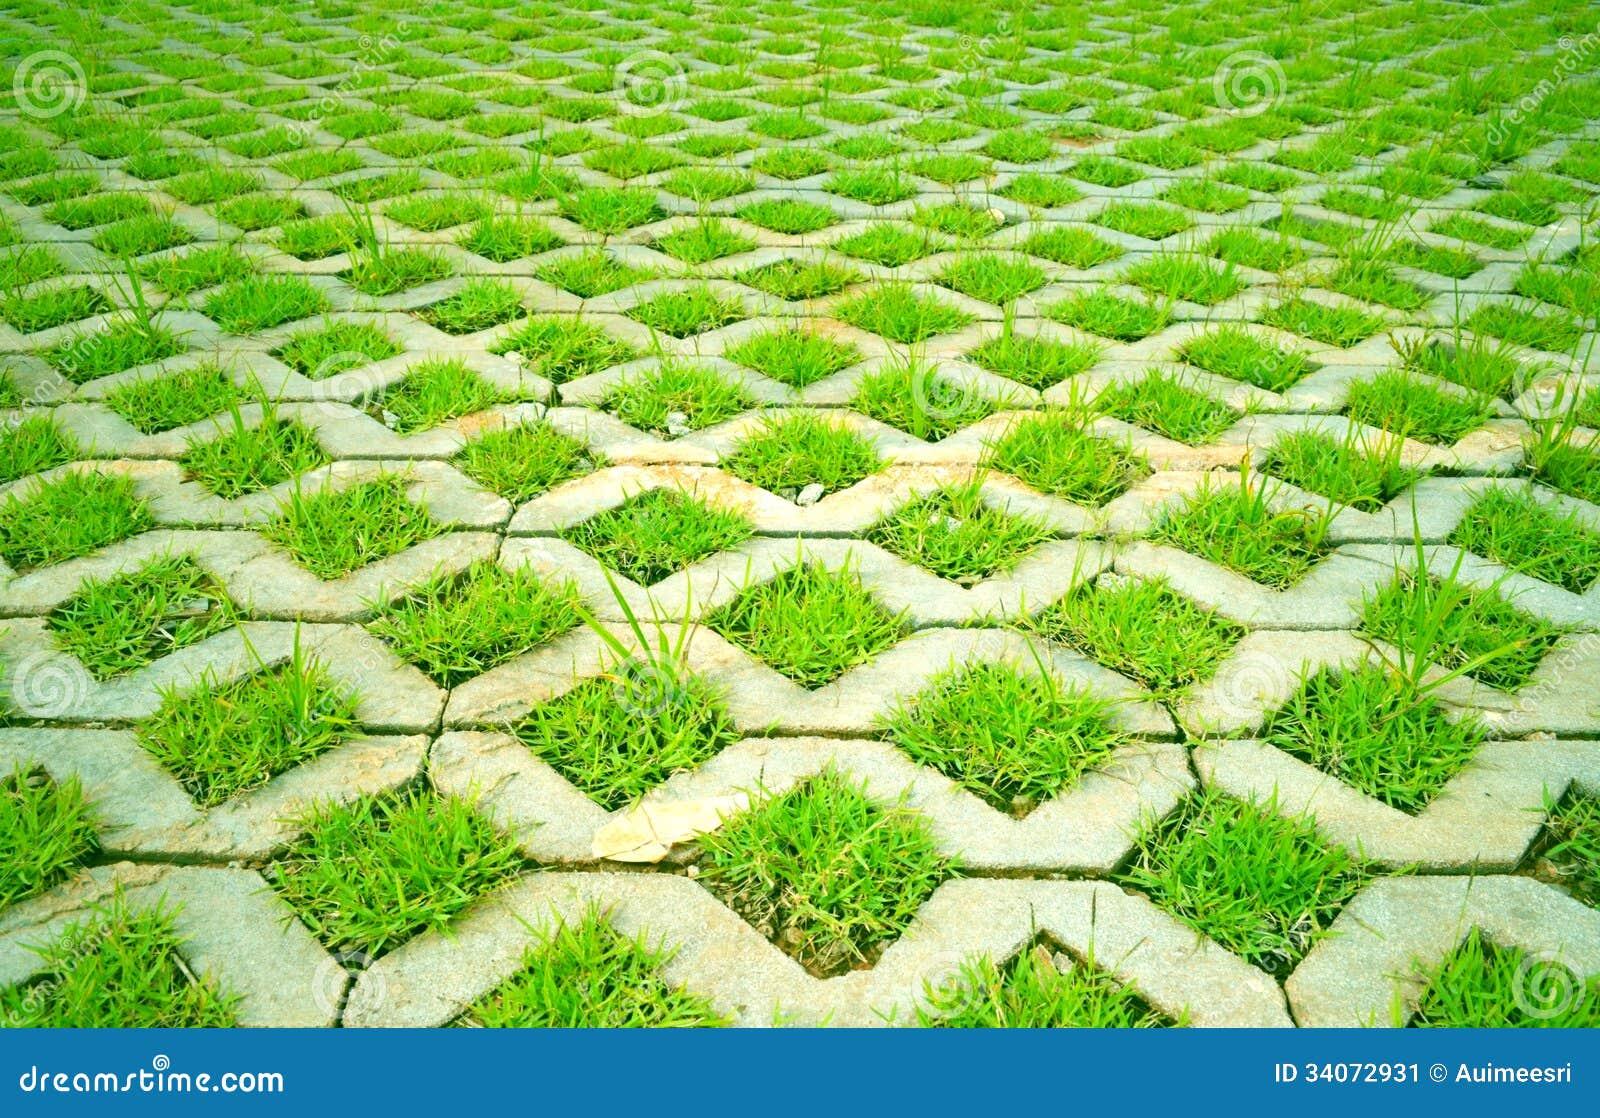 grass in concrete stock image image 34072931. Black Bedroom Furniture Sets. Home Design Ideas